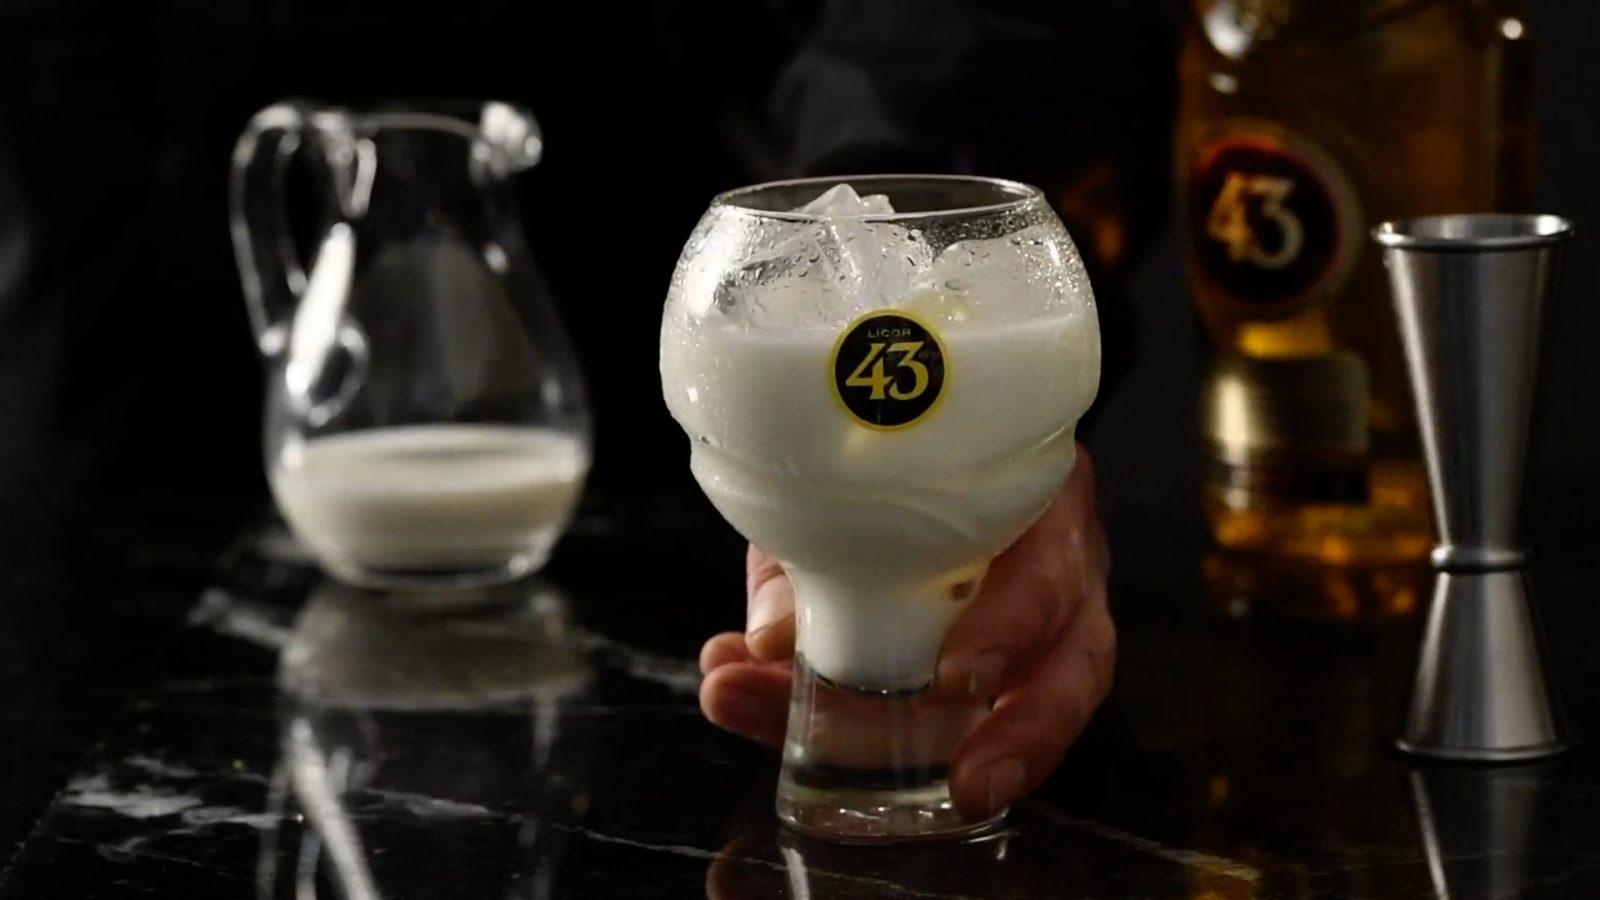 Blanco 43